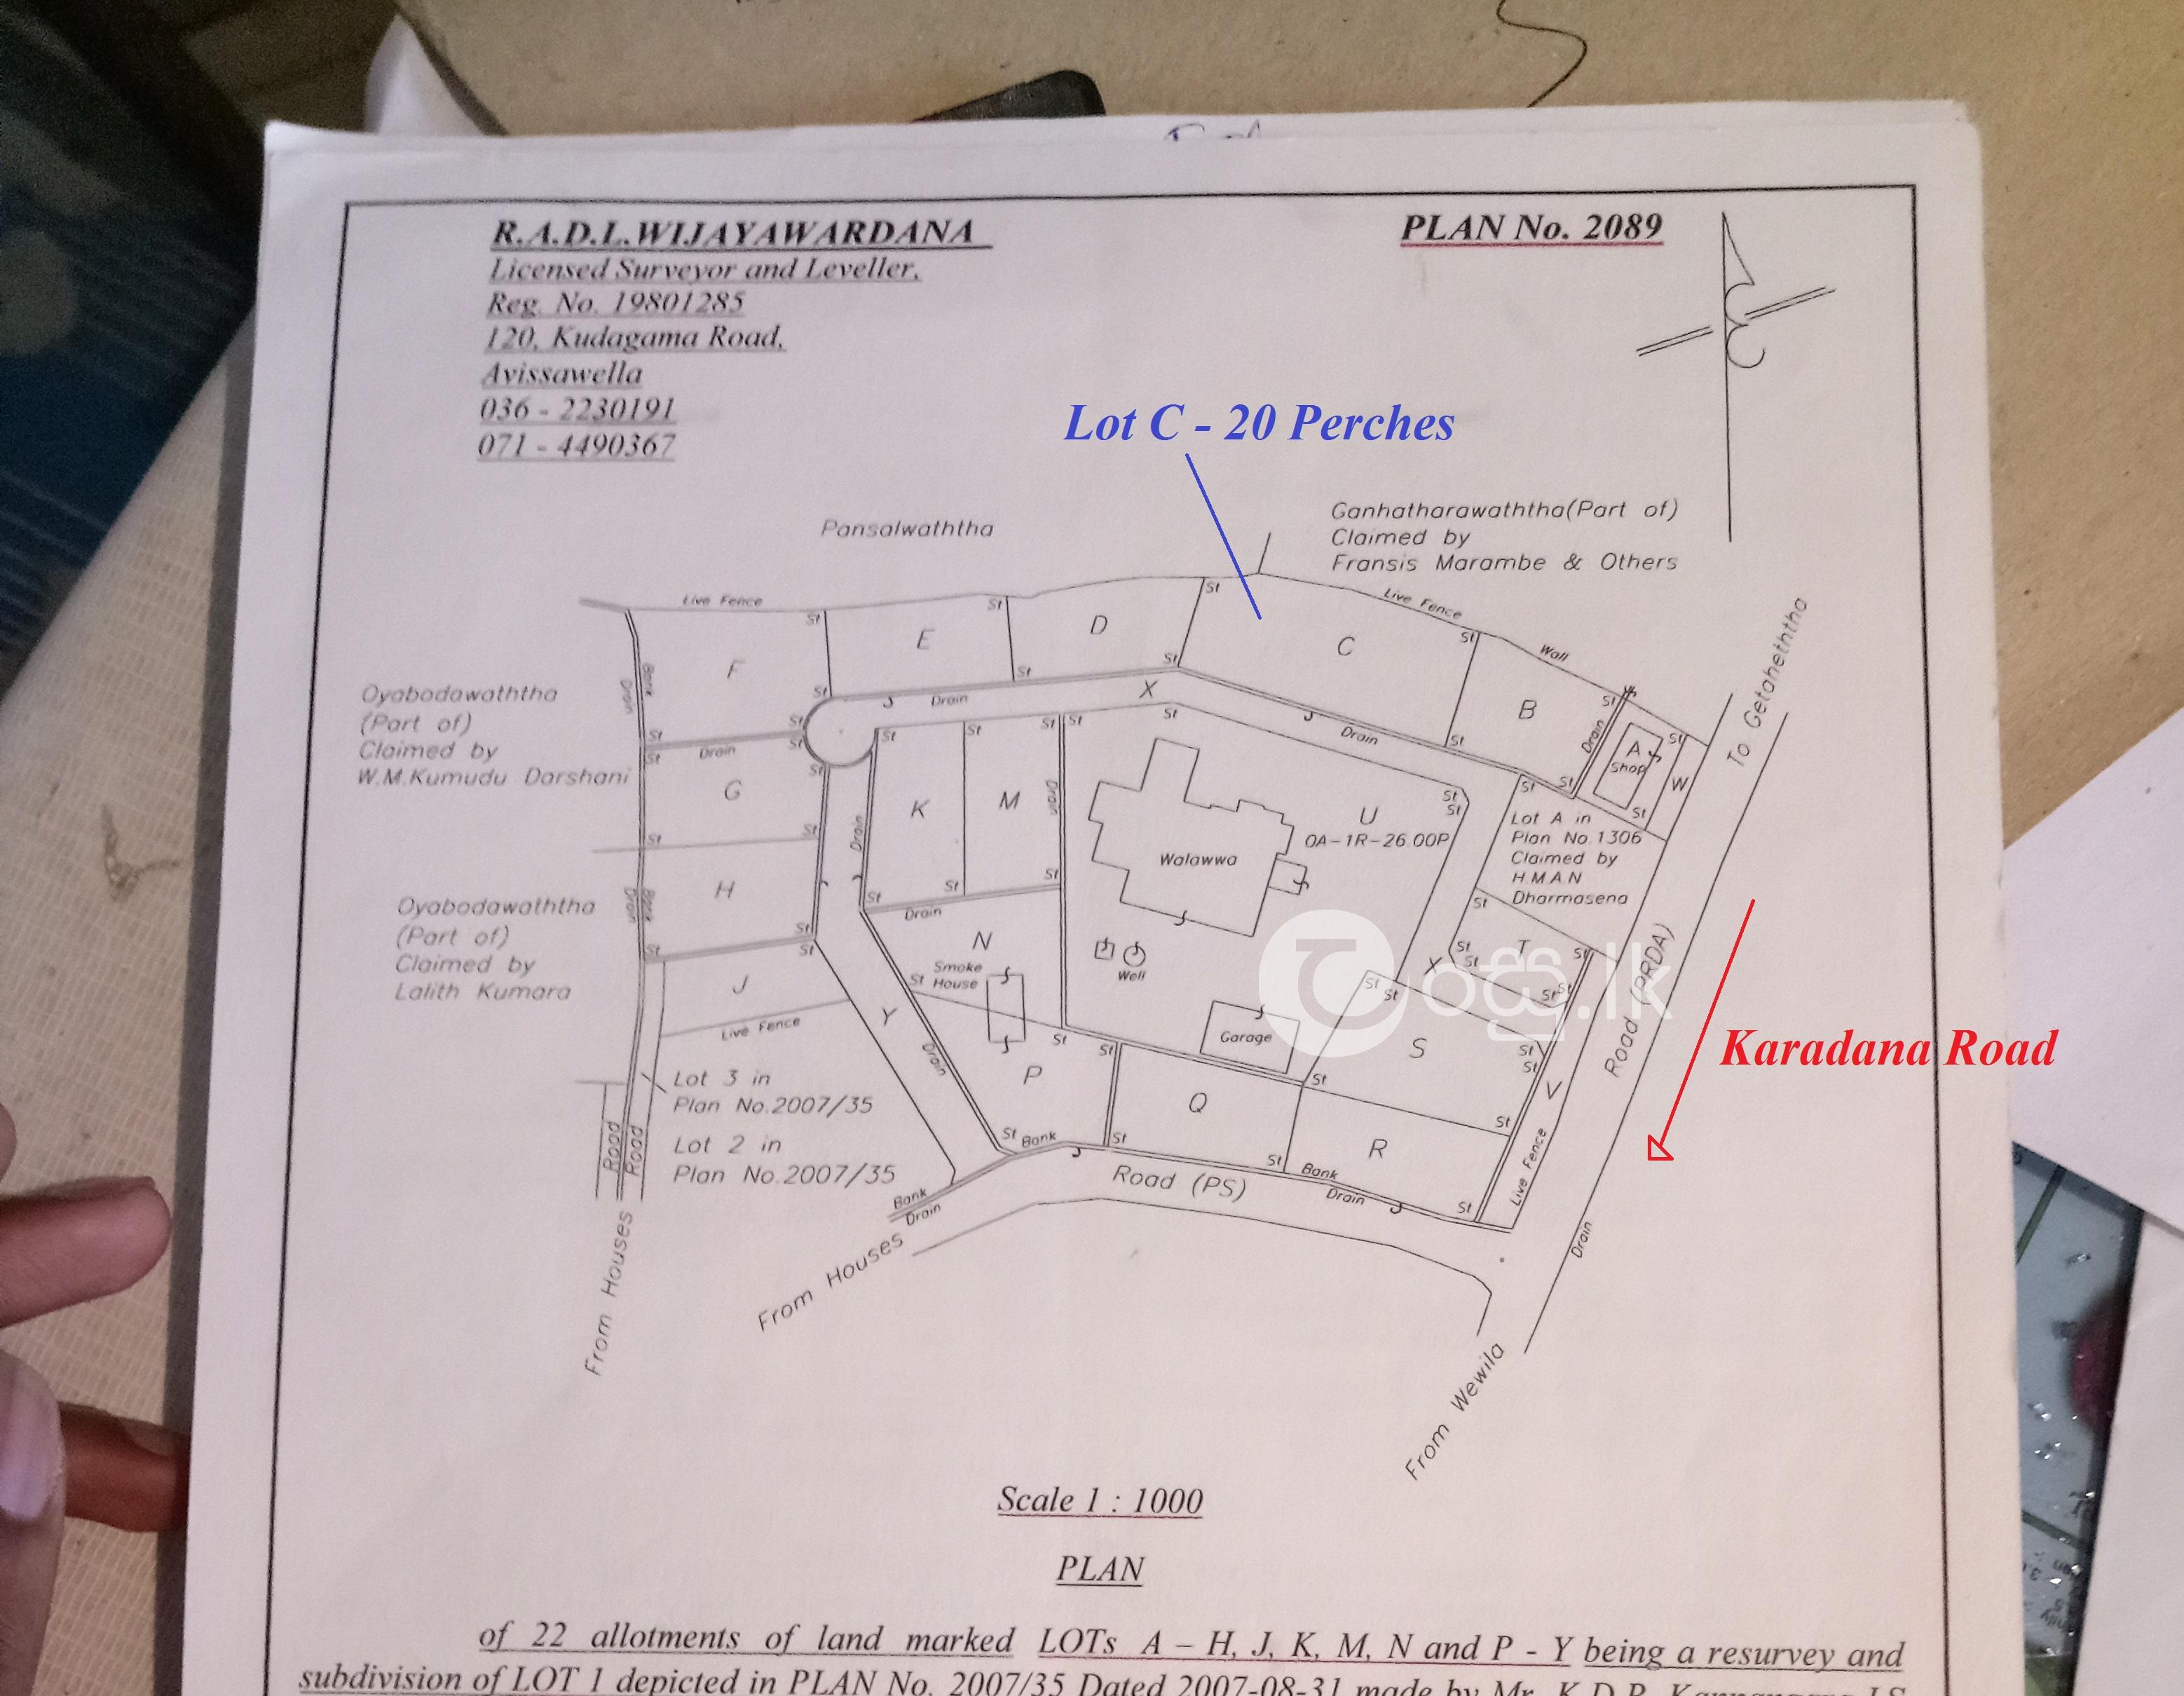 Land for Sale in Getaheththa  Marambe Town Land in Eheliyagoda